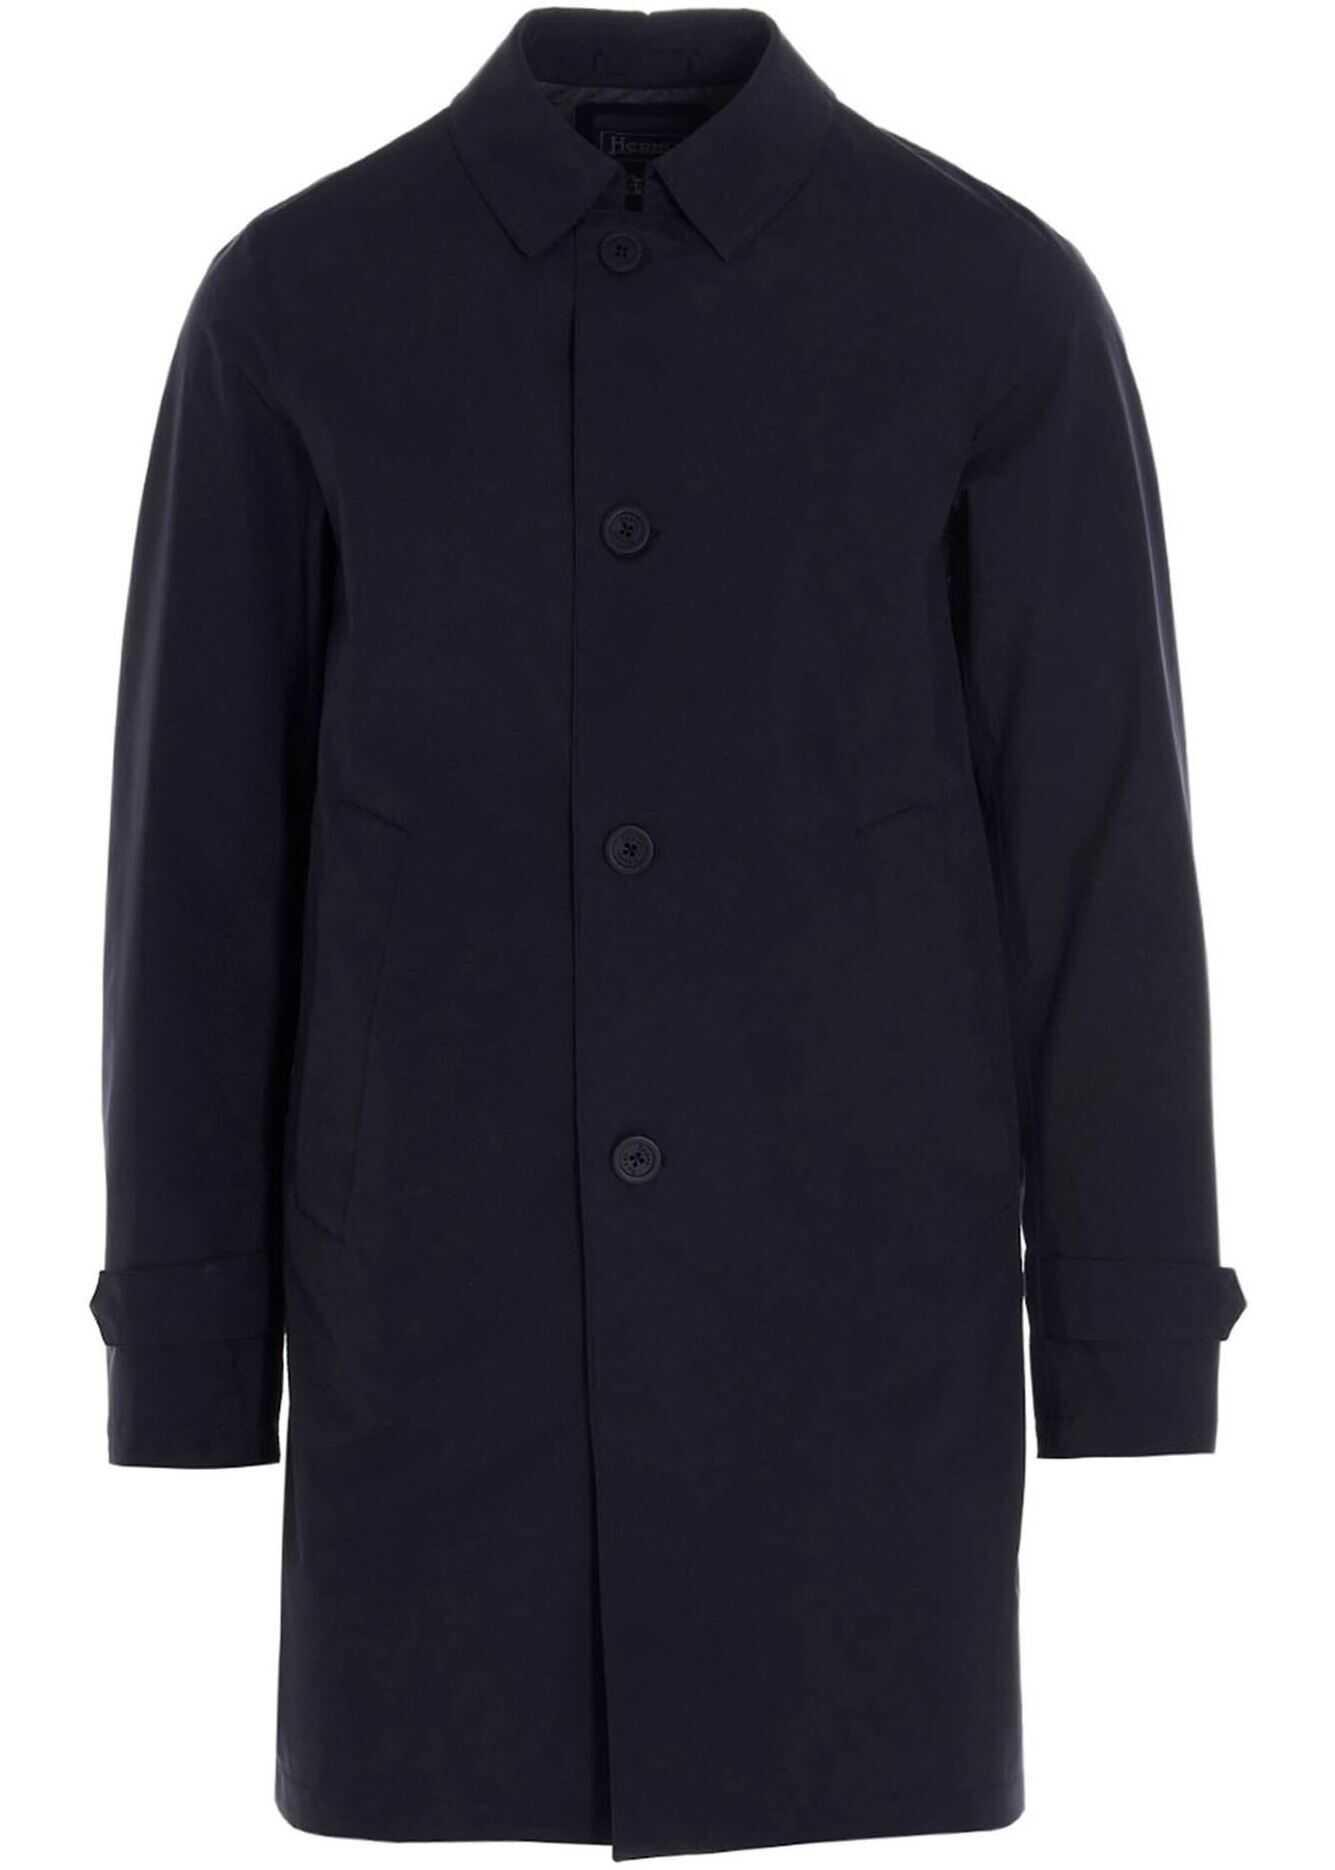 Herno Gore-Tex Raincoat In Blue Blue imagine